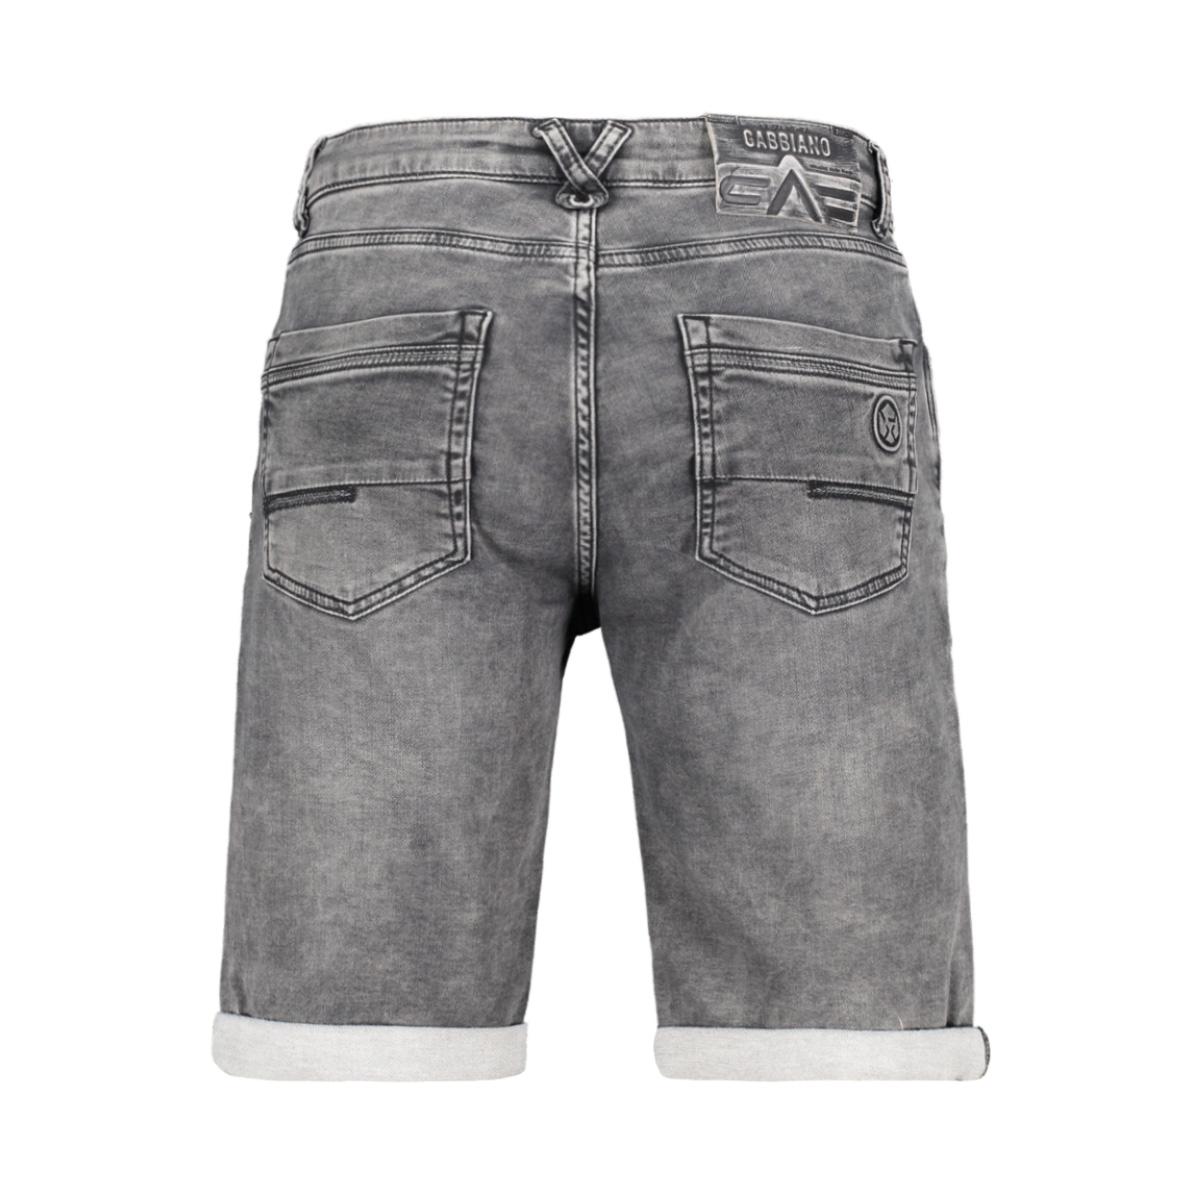 short jogg 82683 gabbiano korte broek grey